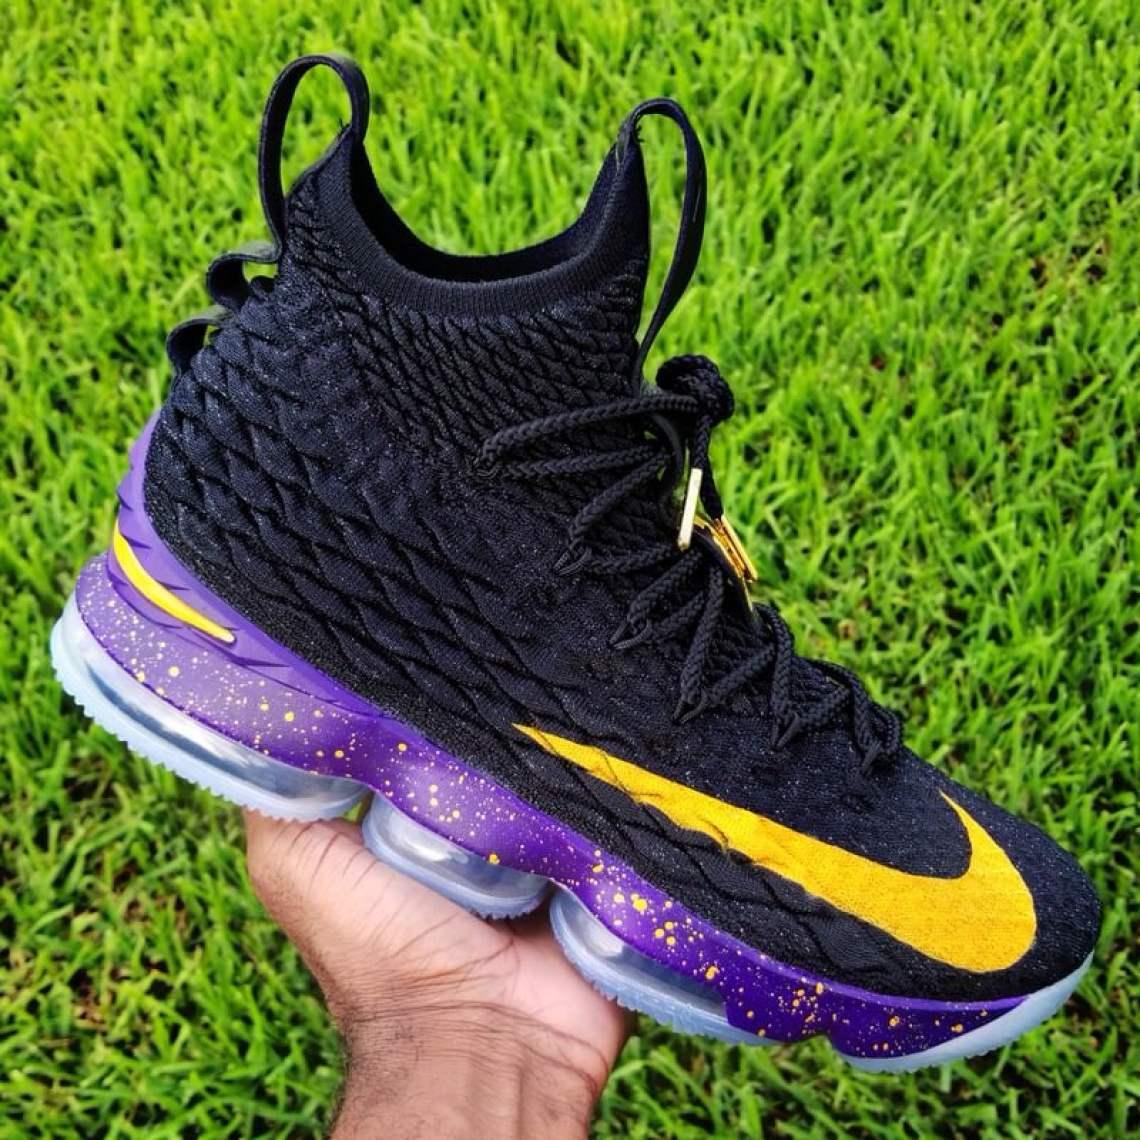 3692383982a Nike LeBron 15 Boys  Preschool Nike Basketball